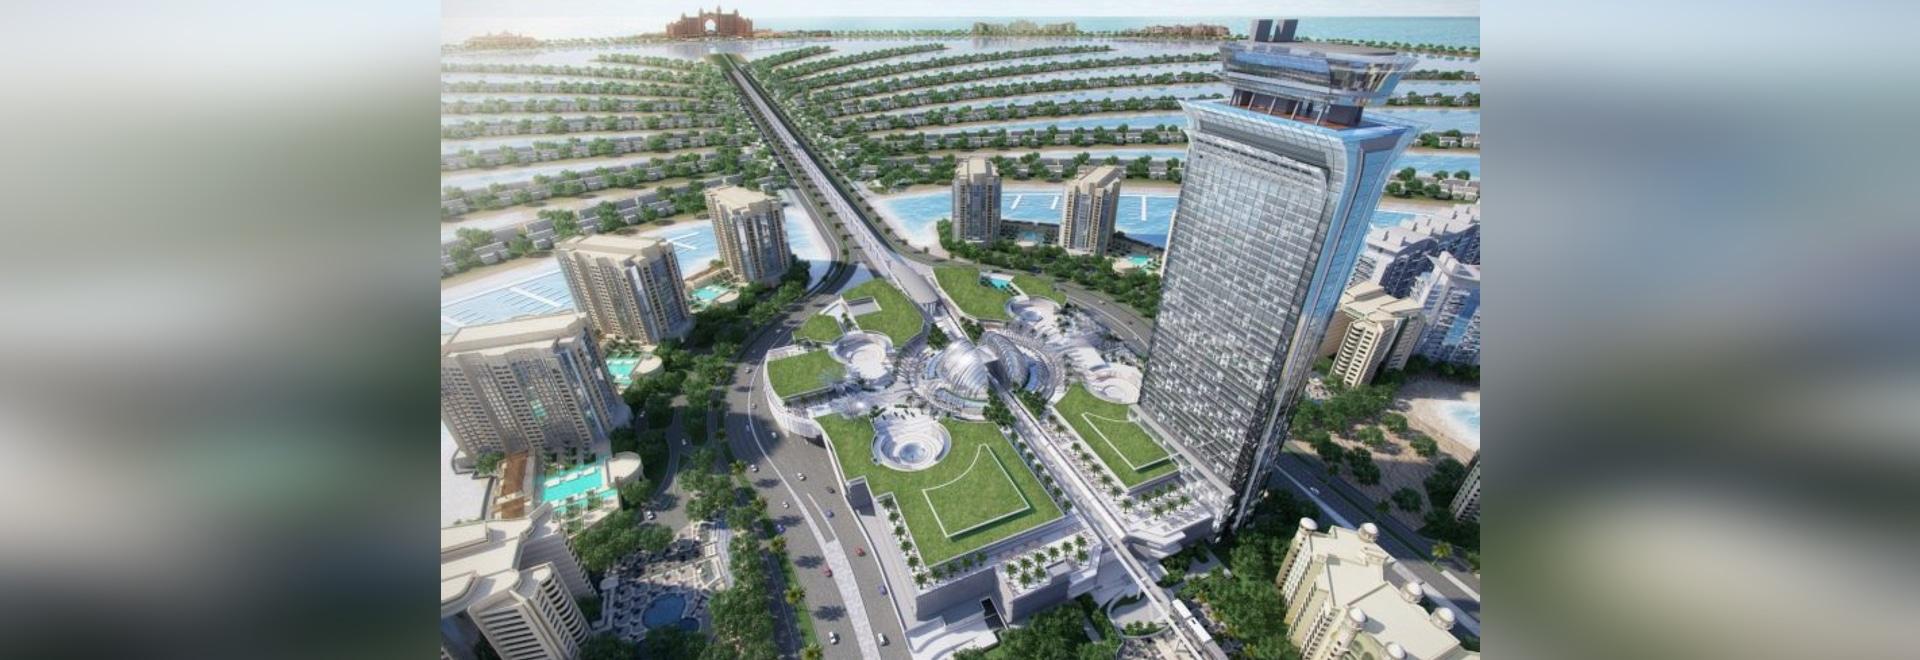 Nakheell Mall – Dubai